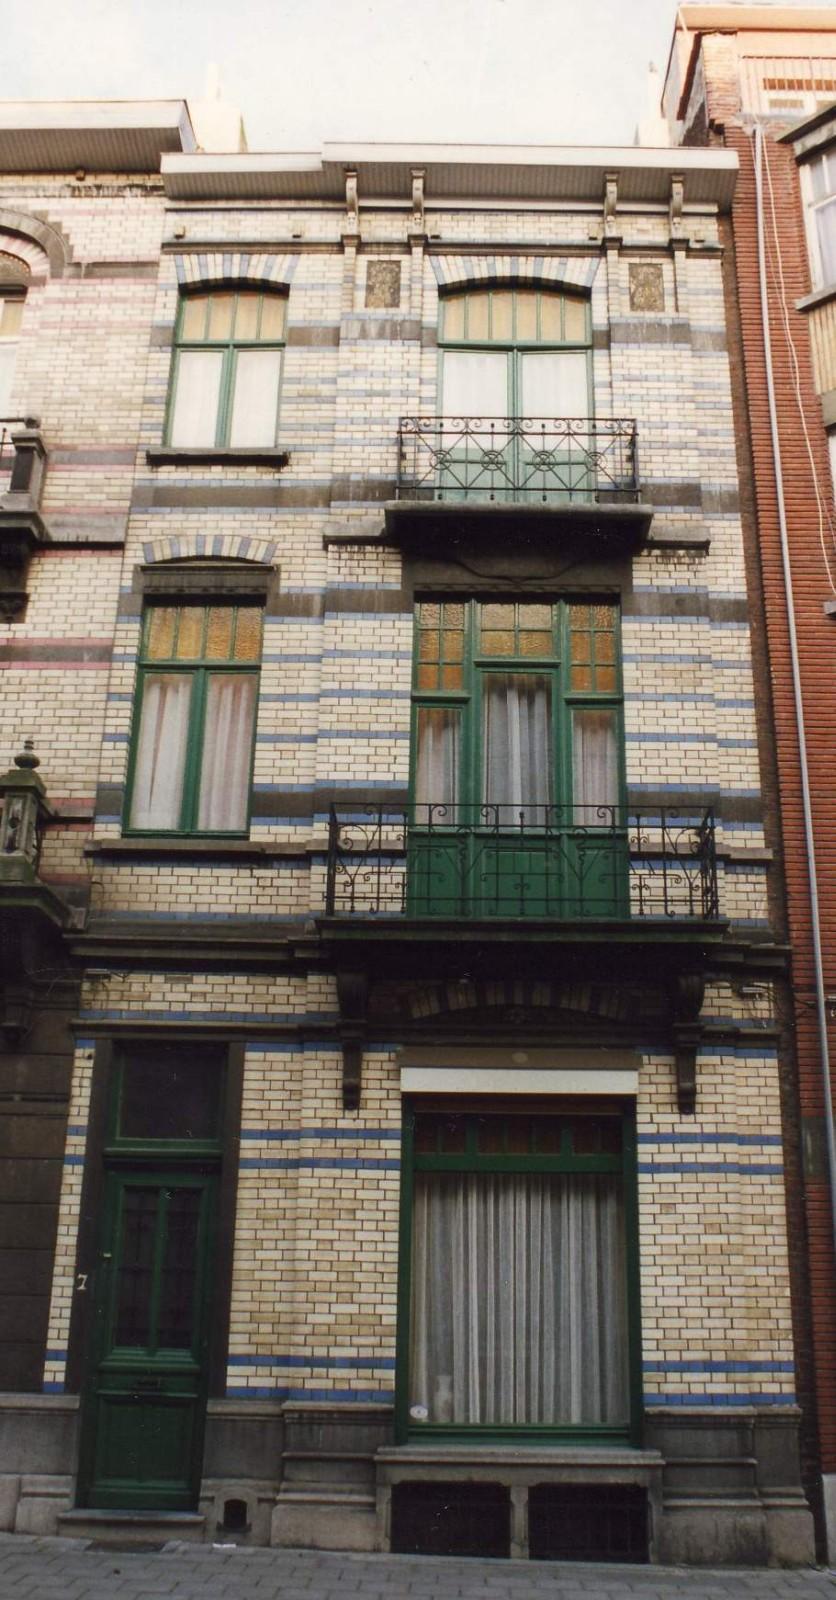 Rue Peter Benoit 7., 1993